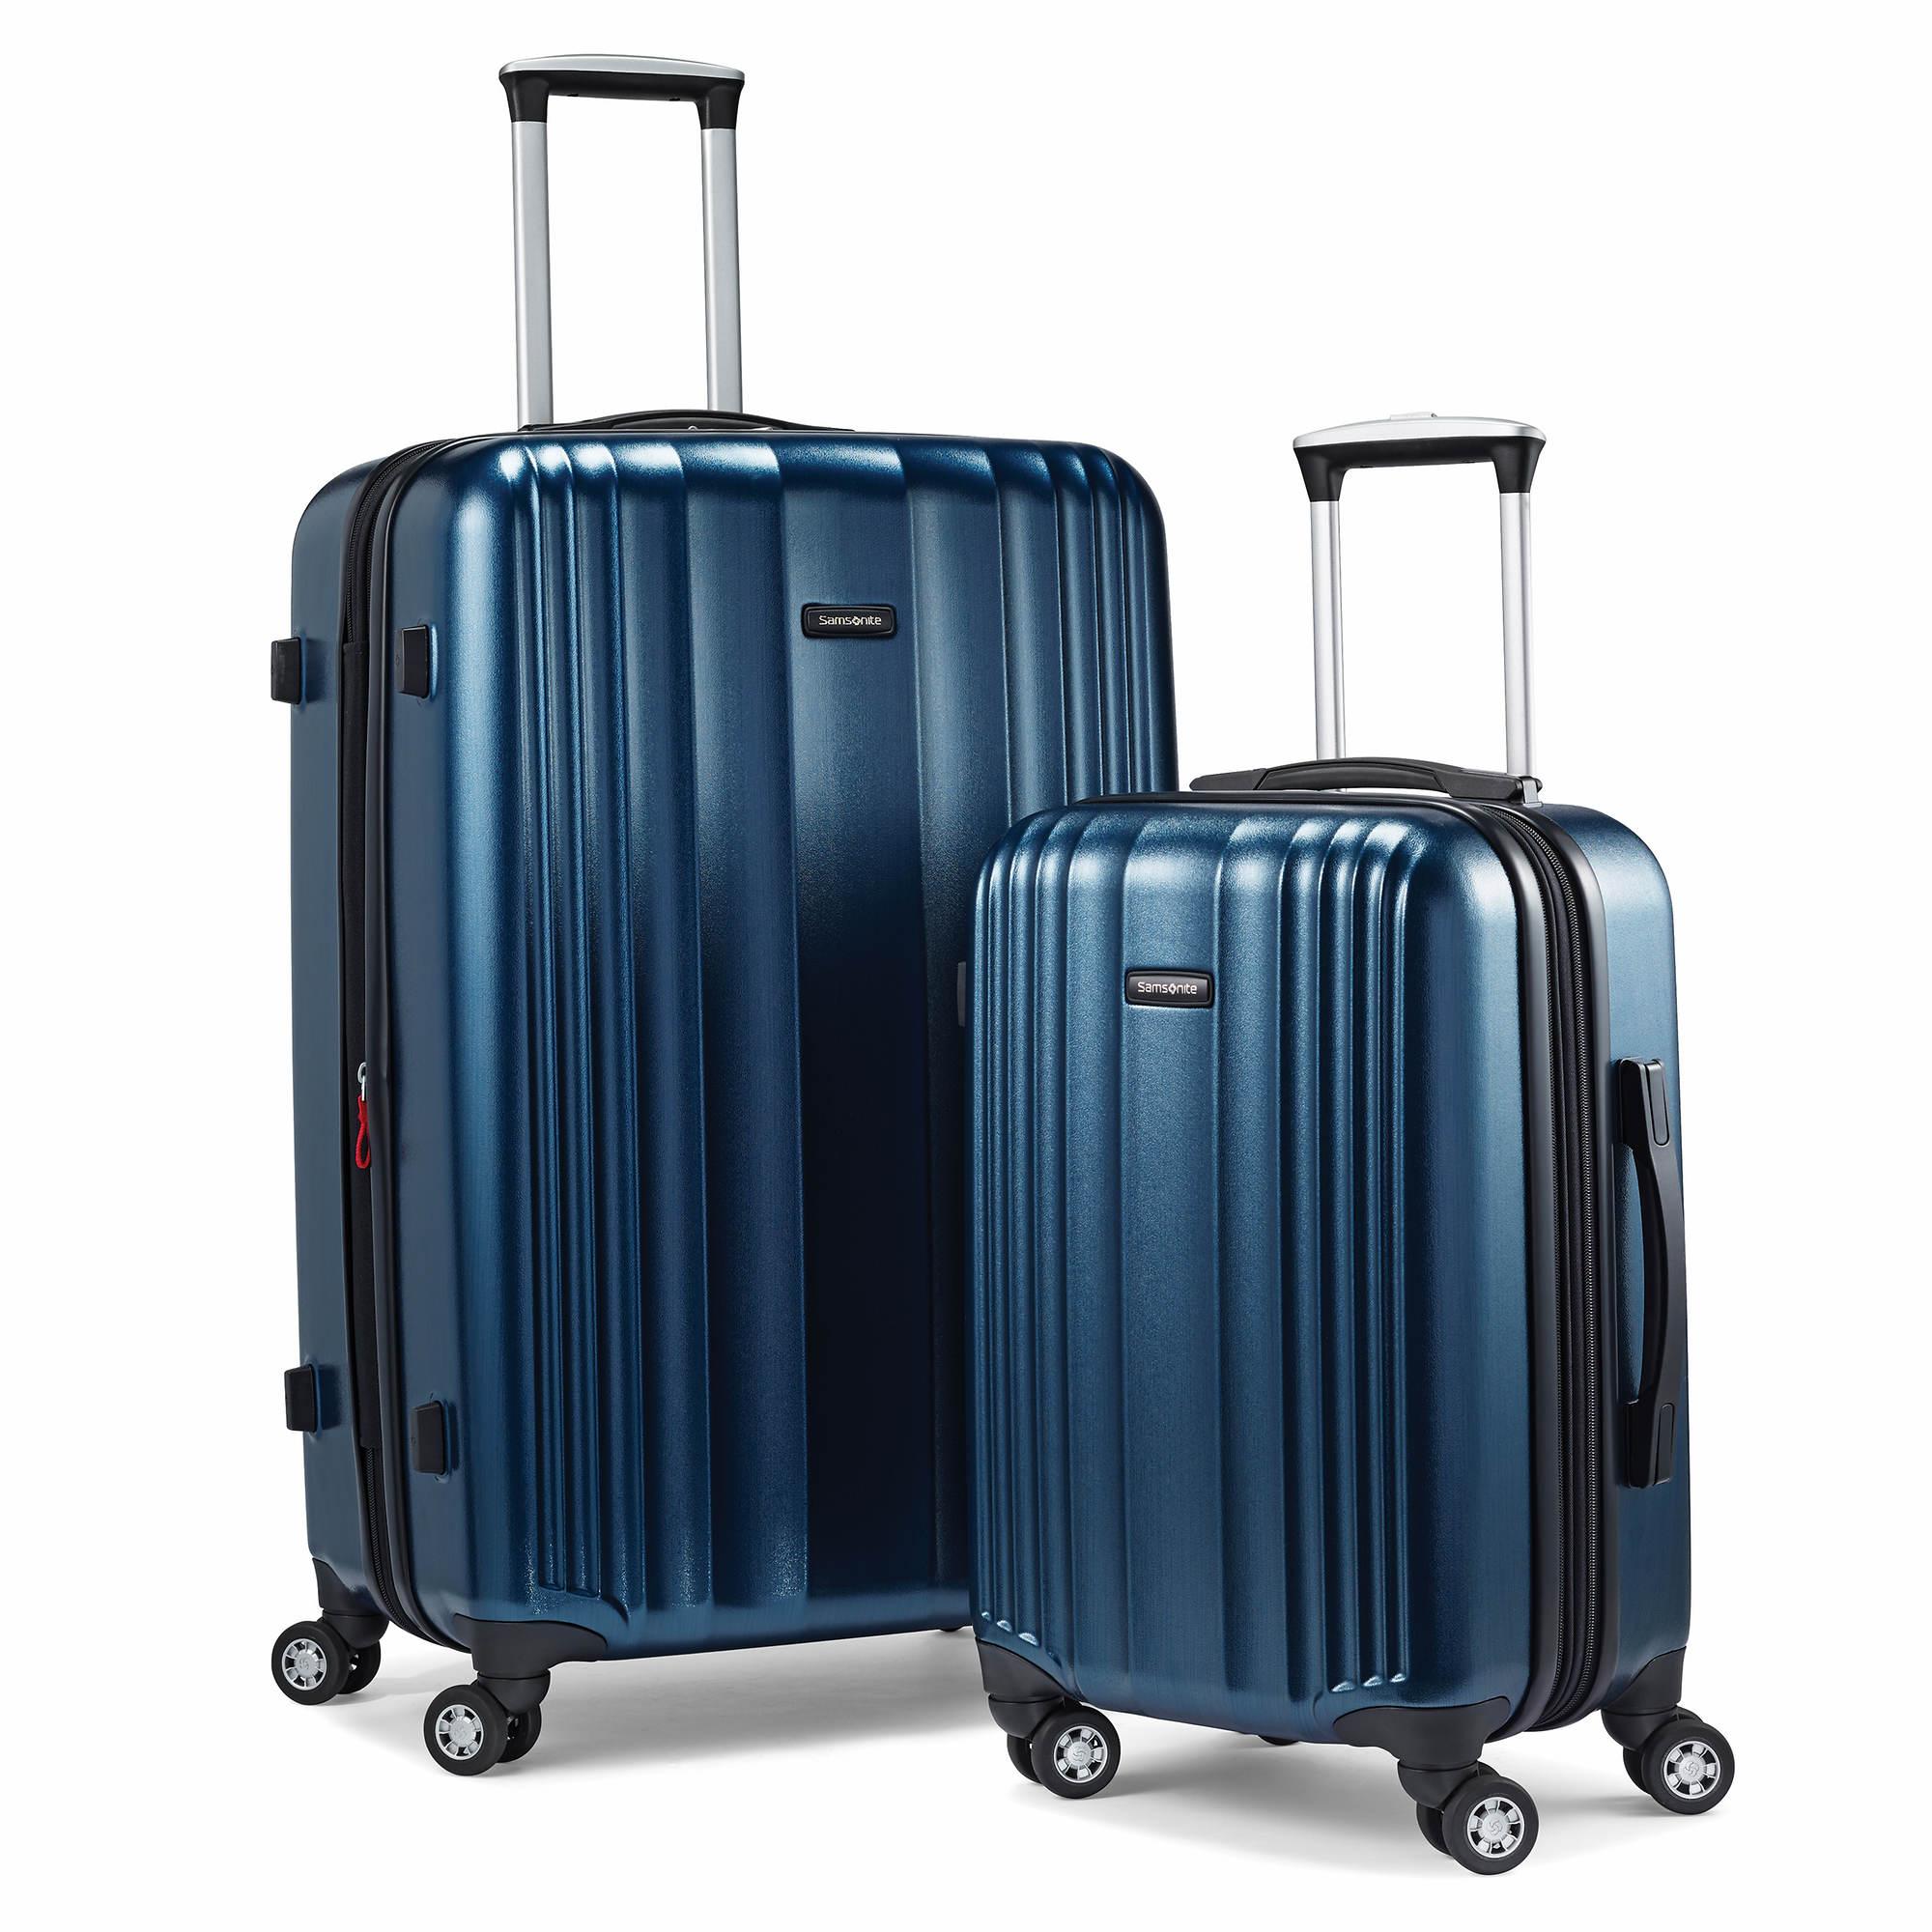 Samsonite 2-Pc. Hardside Luggage Set - Blue